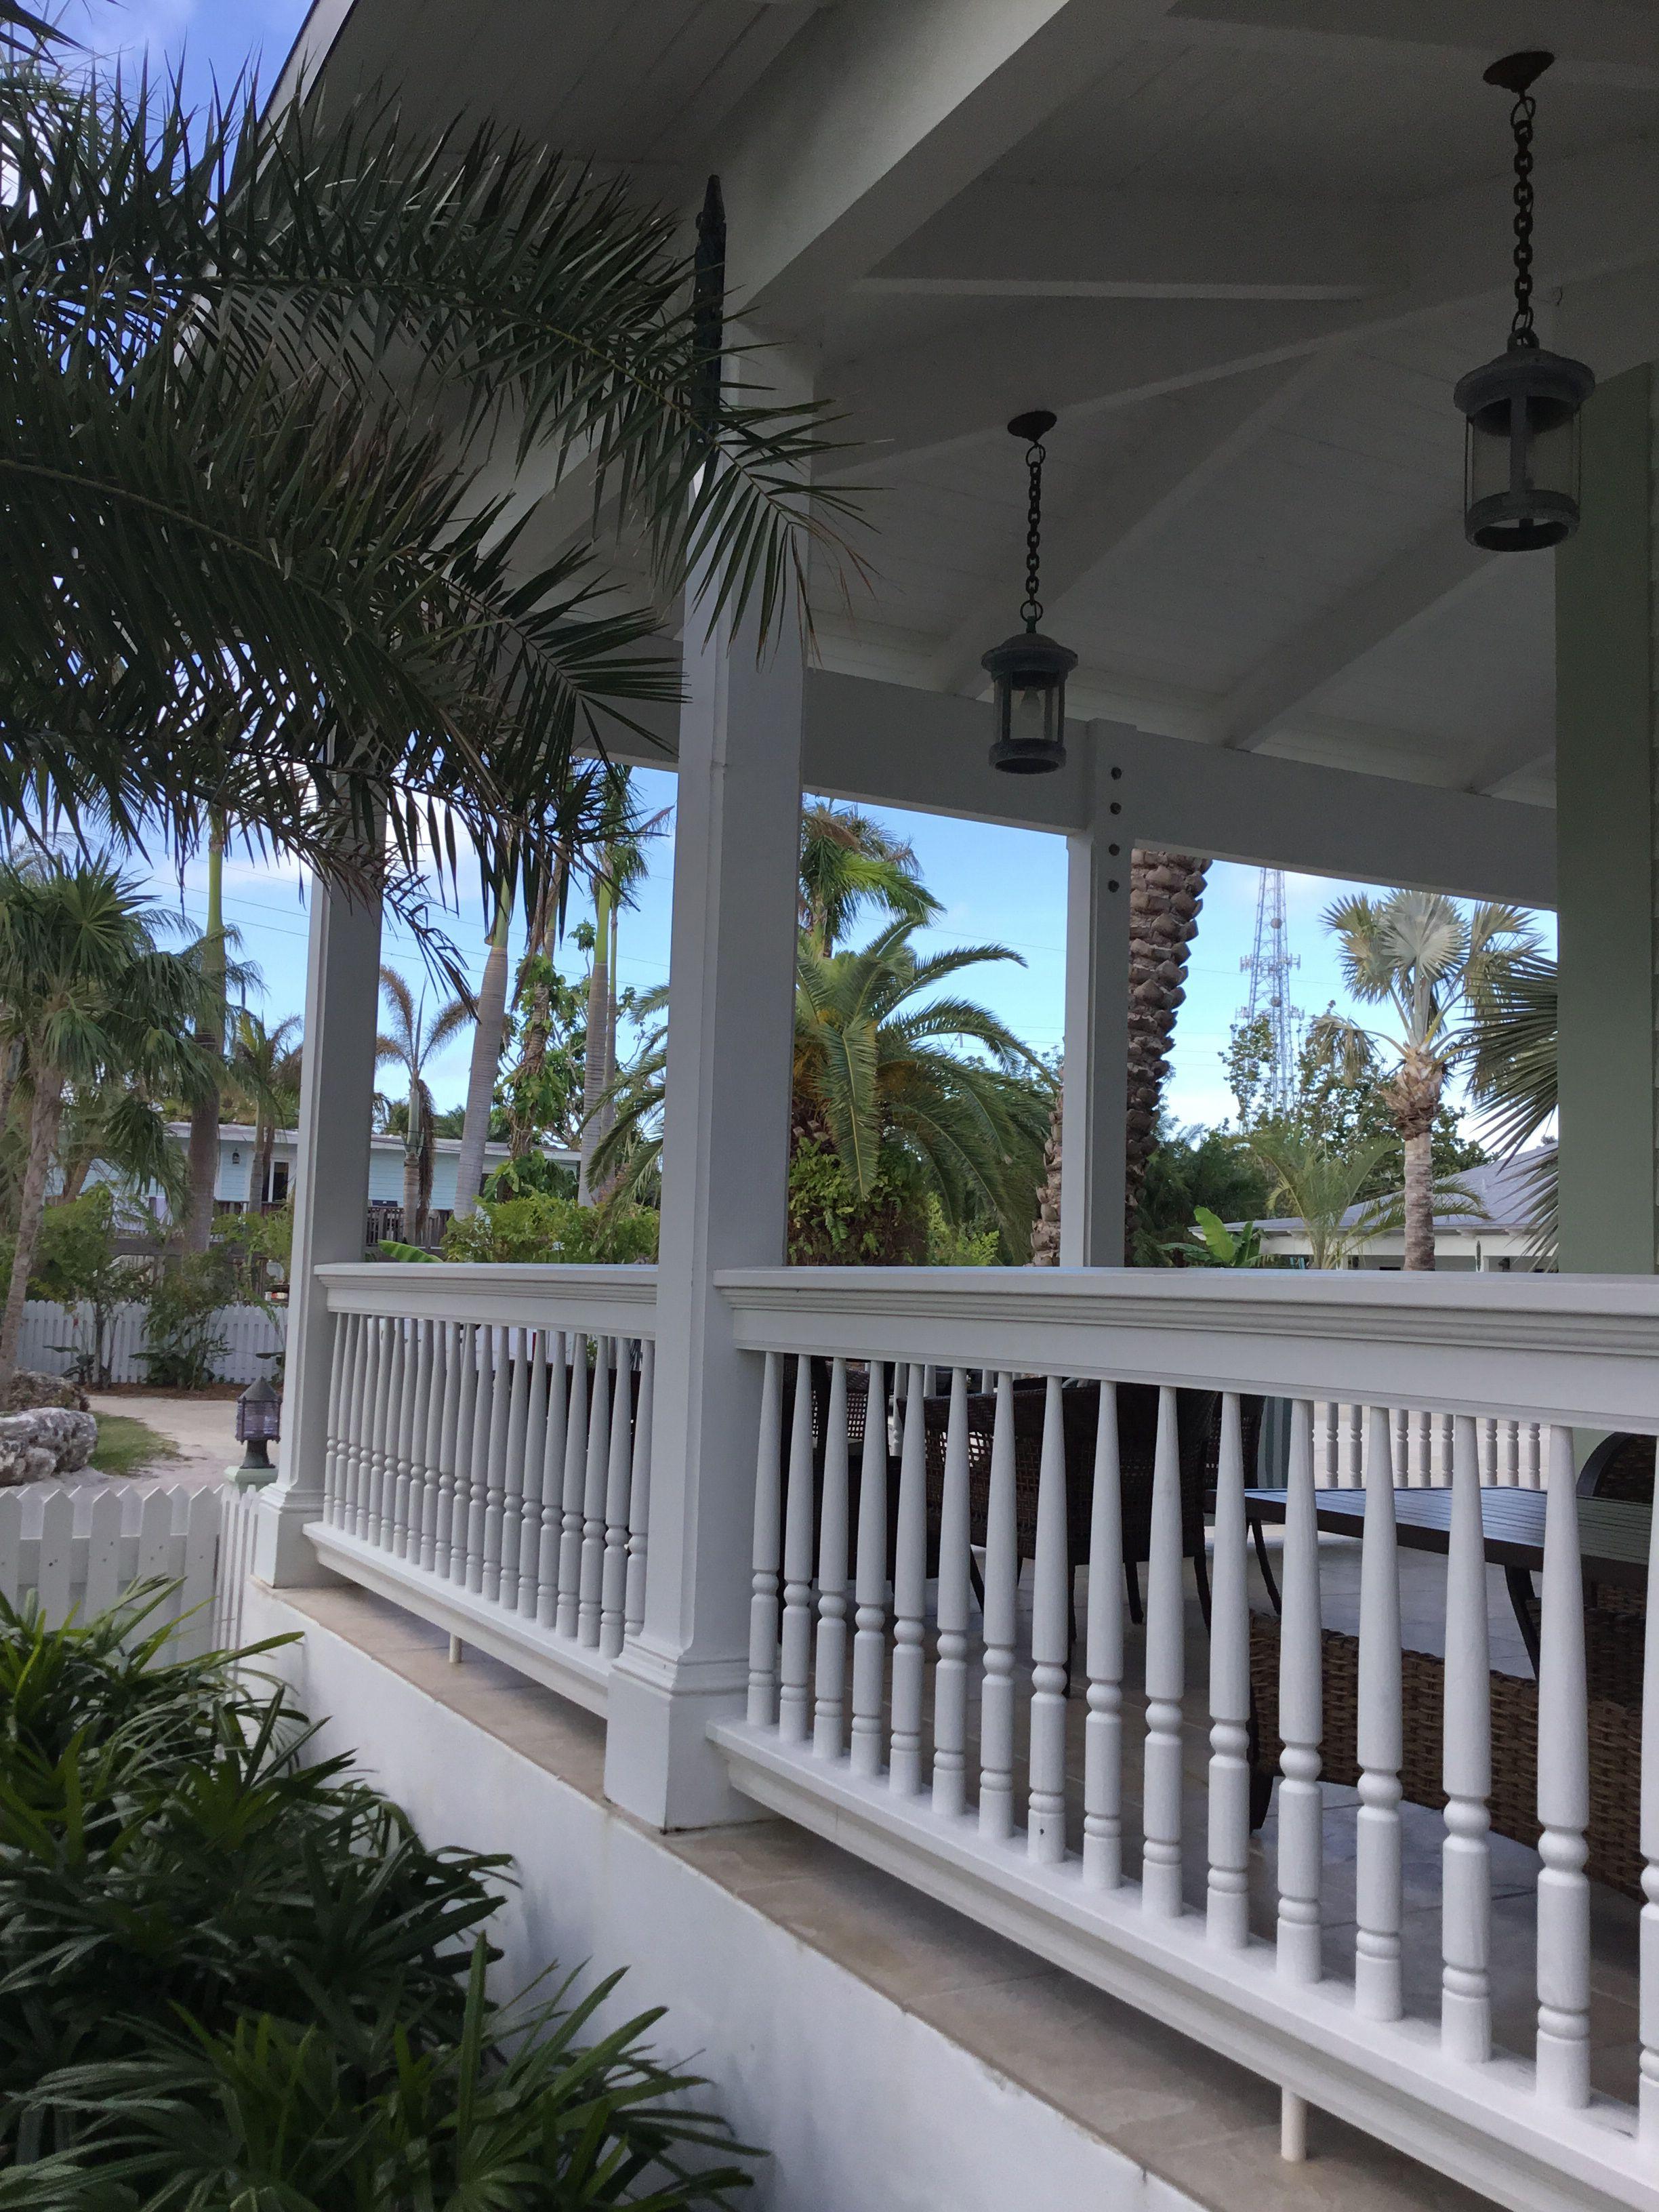 Verandaracke Caribbean Rentals Islamorada Florida Vacation Home